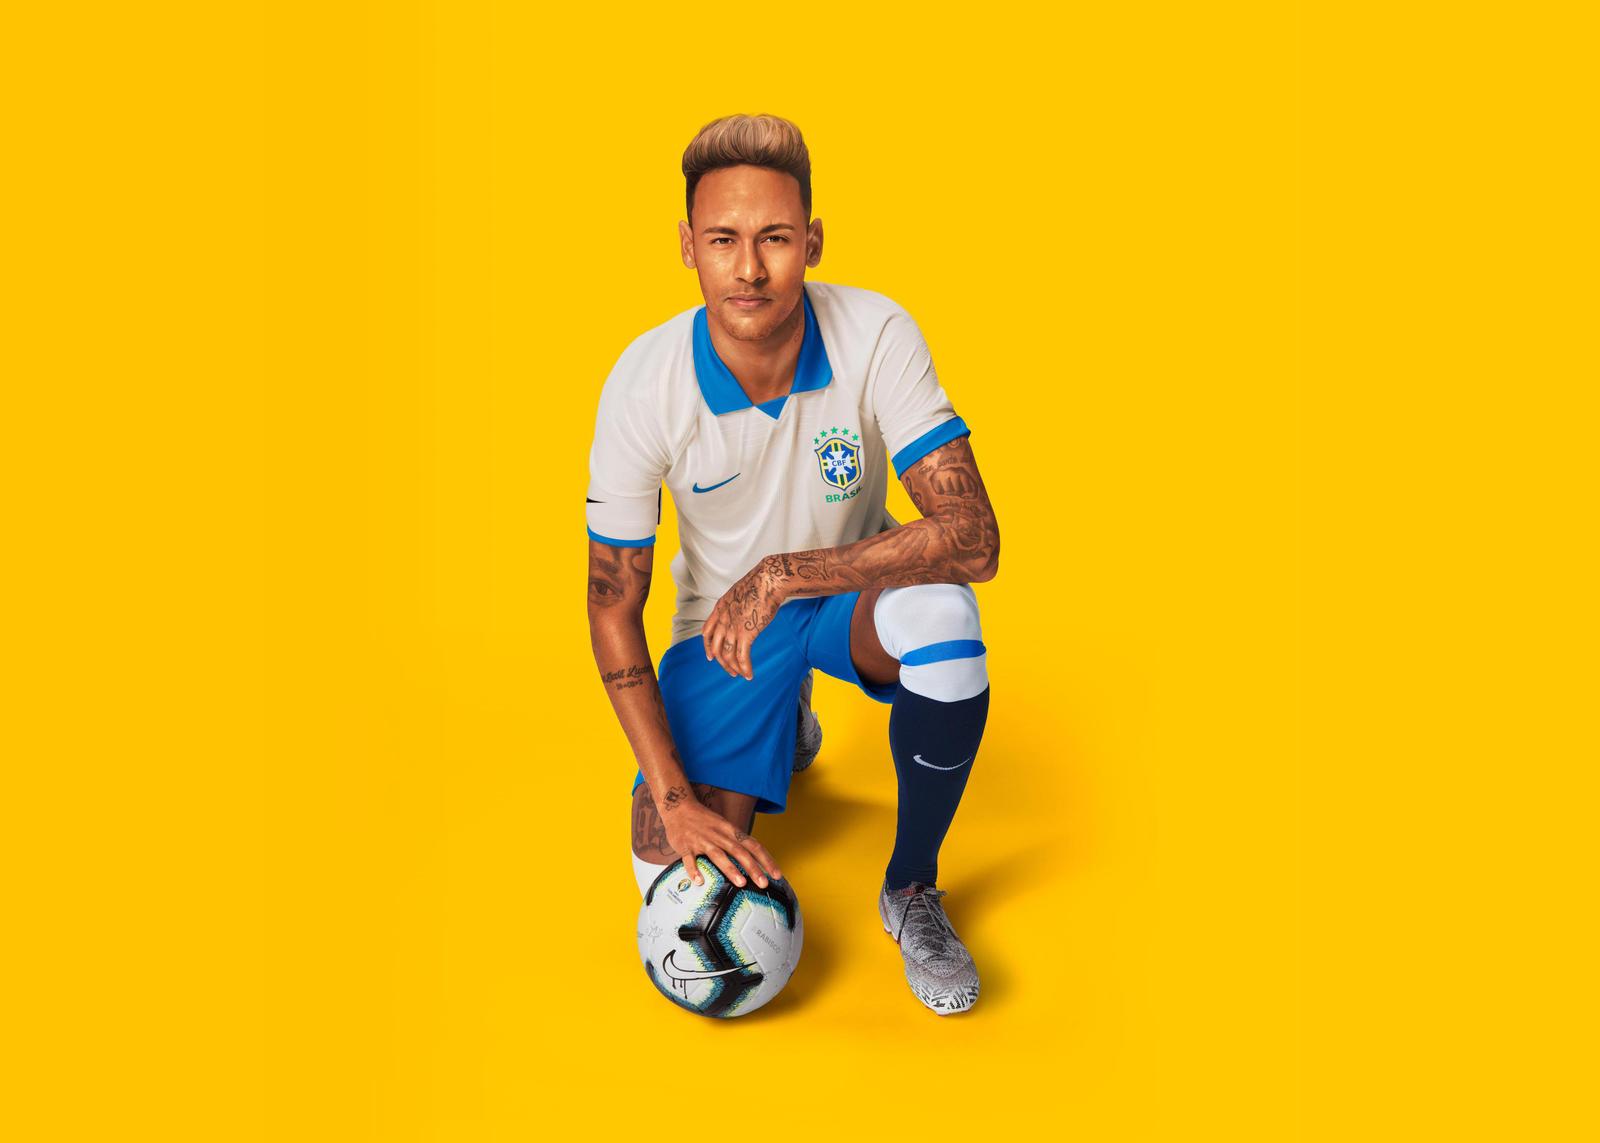 nike-brasil-copa-america-100th-anniversary-jersey-5_rectangle_1600